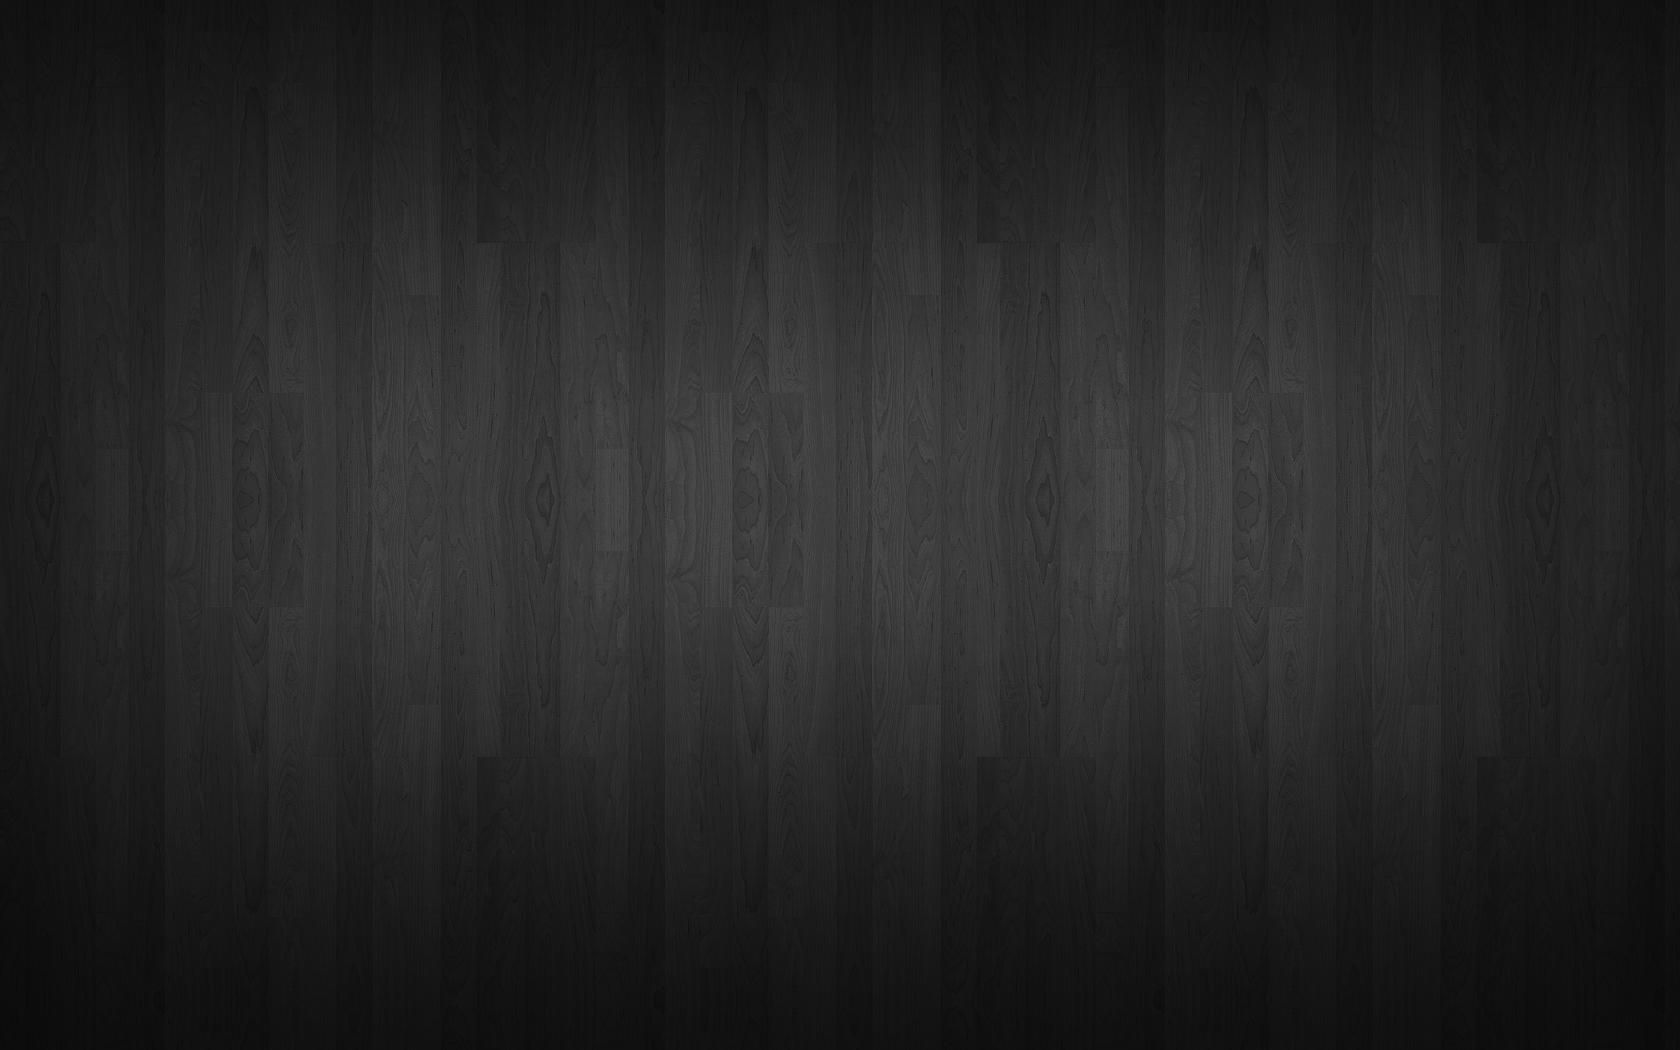 Download this wallpaper [WallpaperStock 16801050] 1680x1050